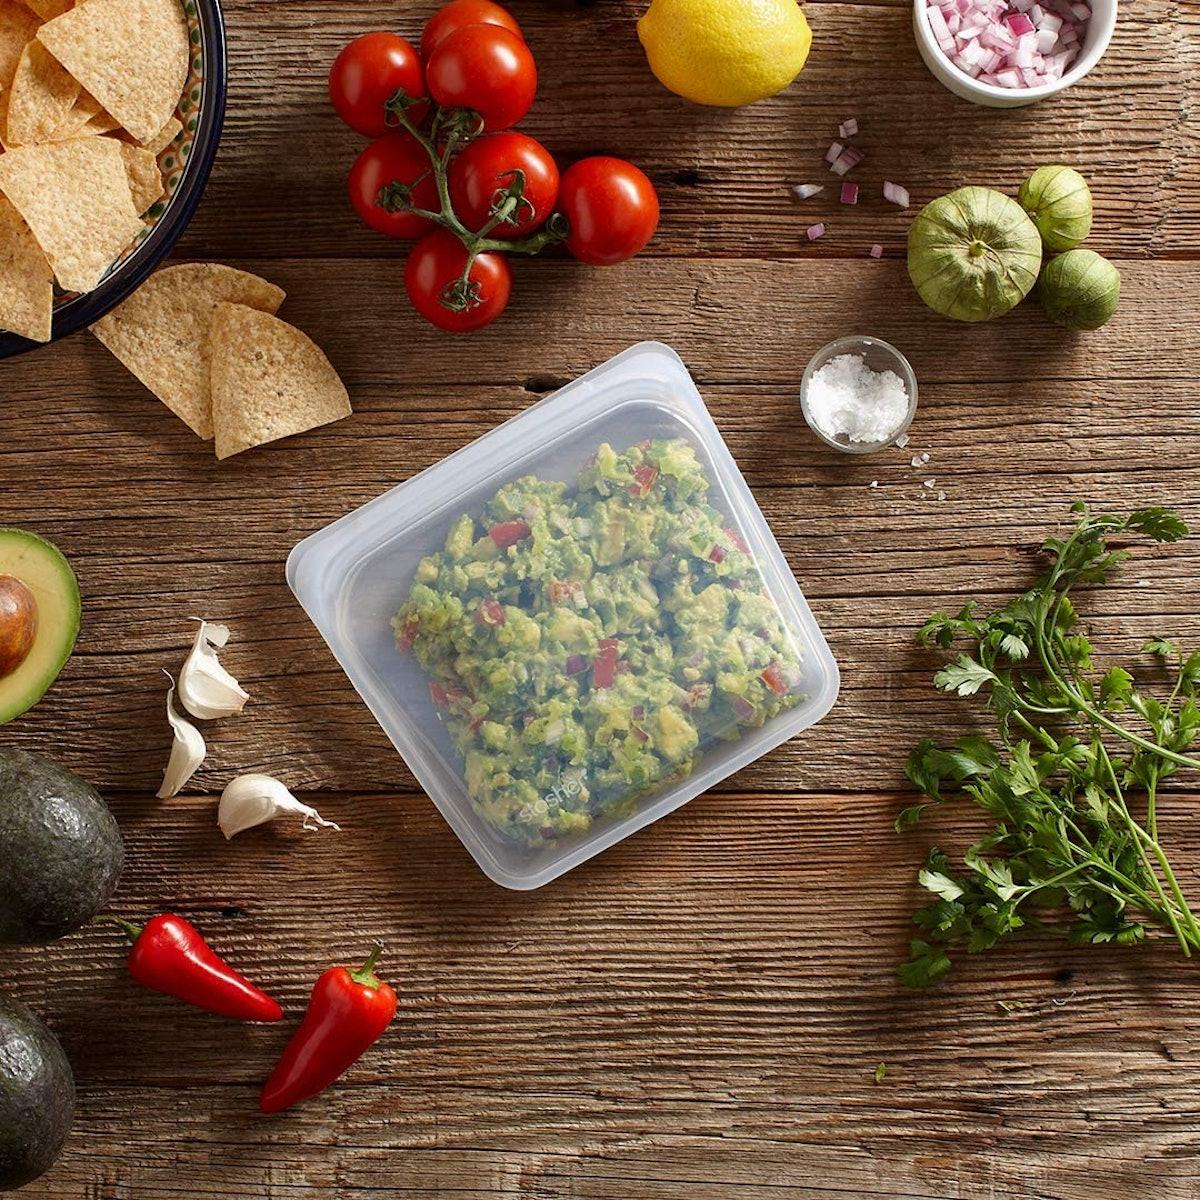 Stasher Silicone Food Storage Bag